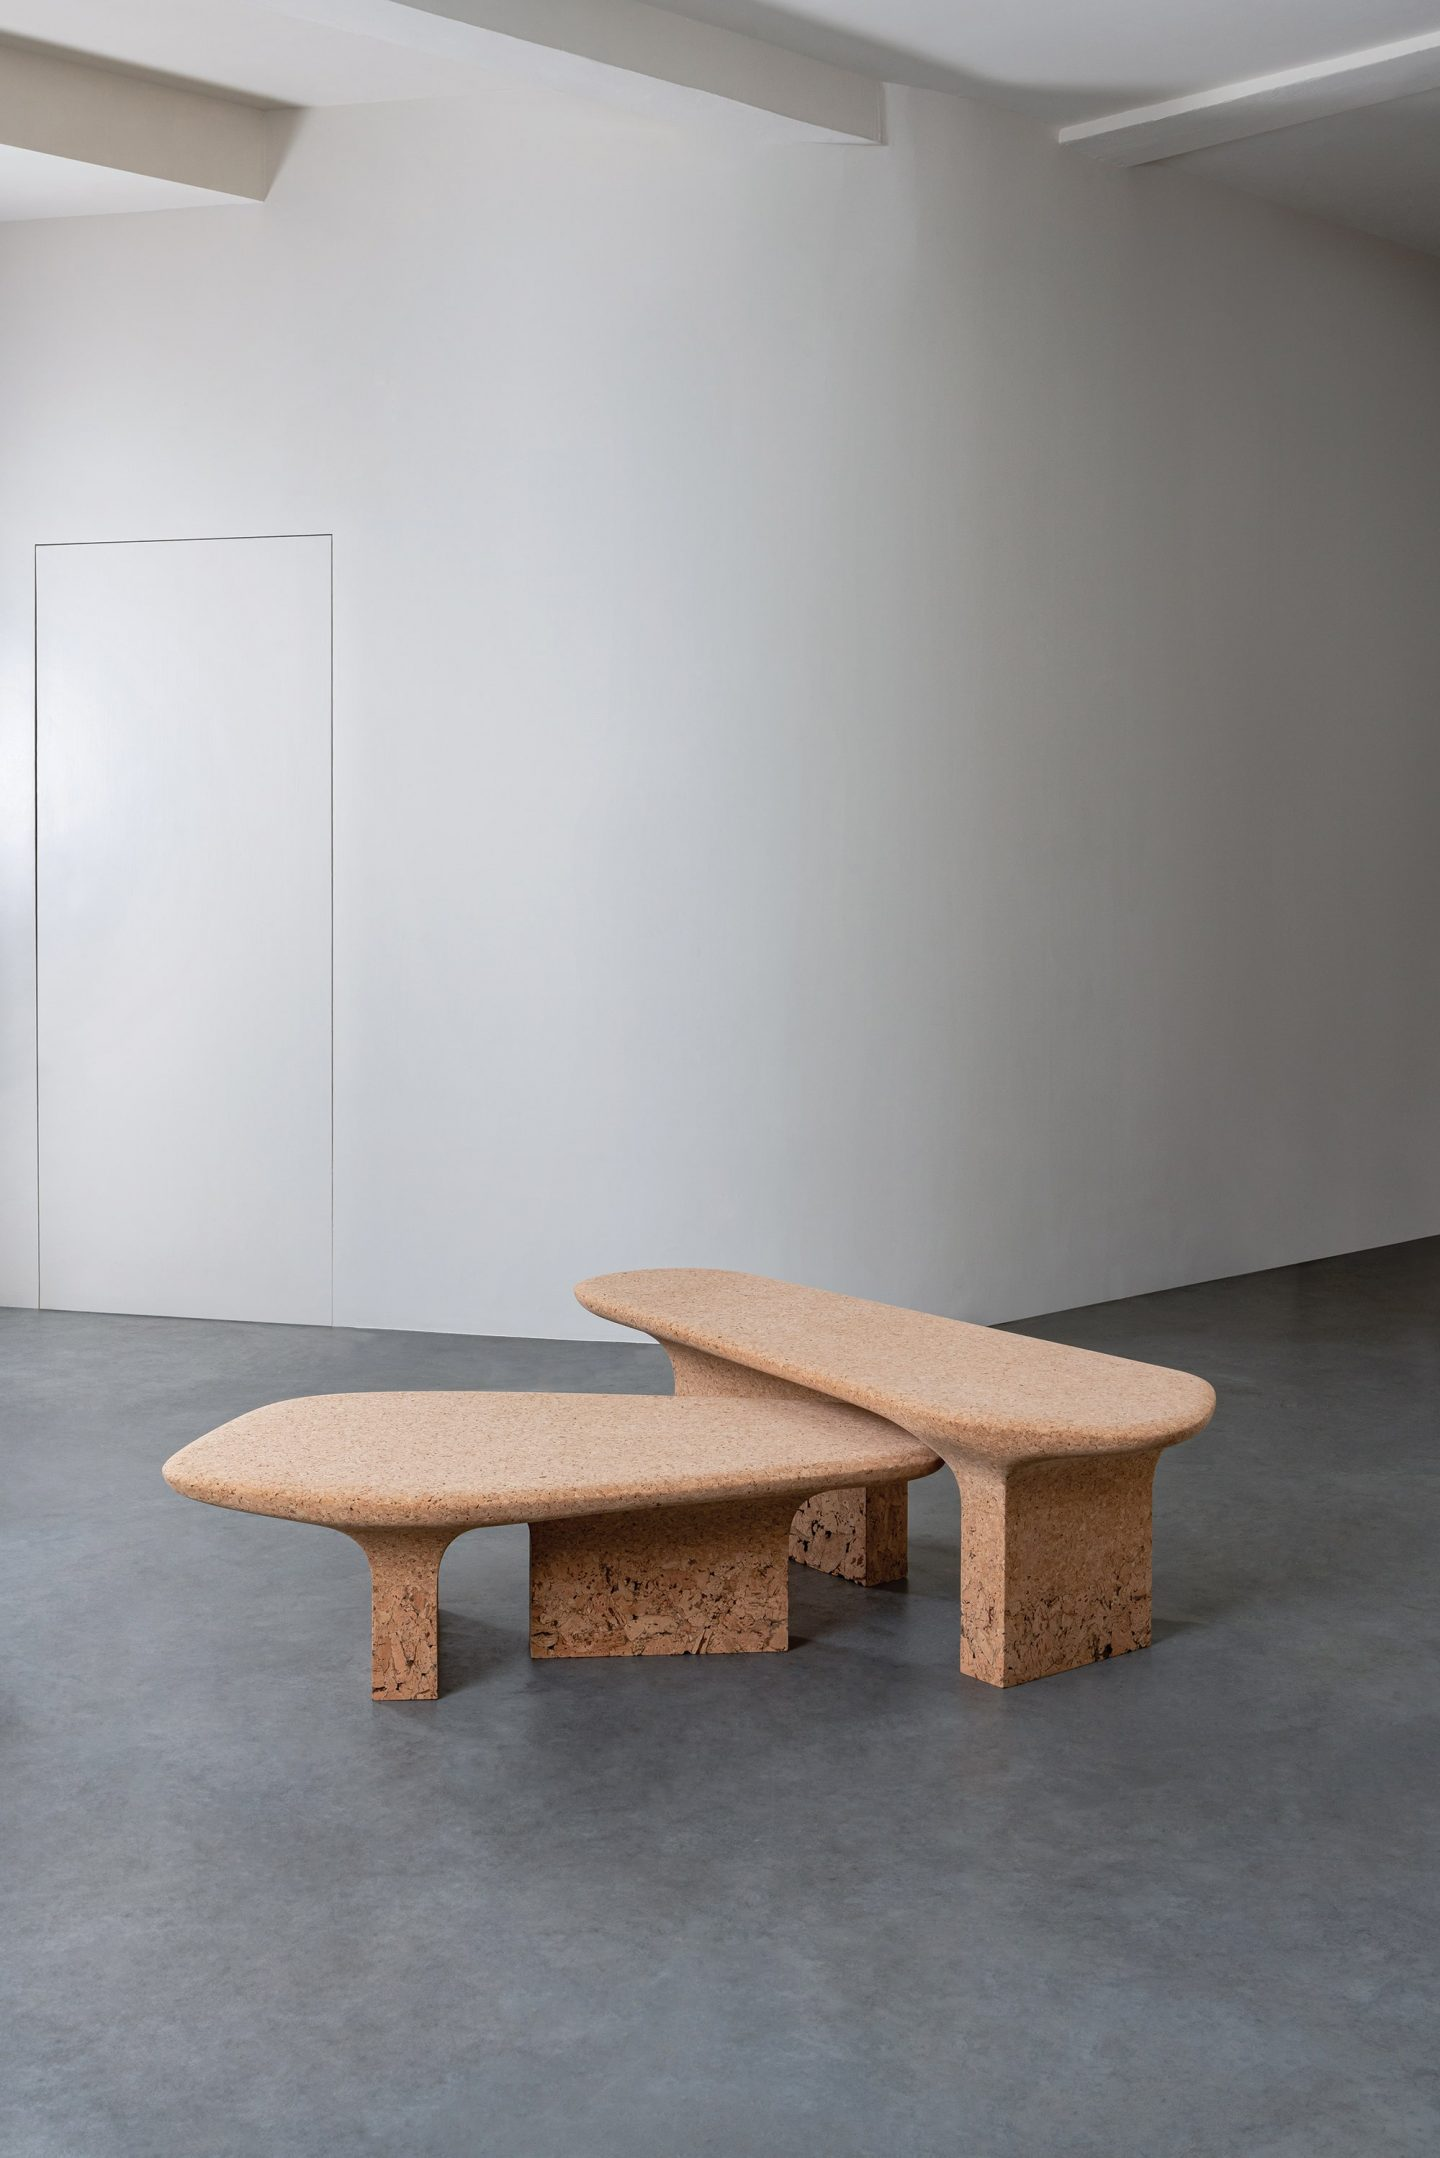 IGNANT-Design-Burnt-Cork-Noé-Duchaufour-15